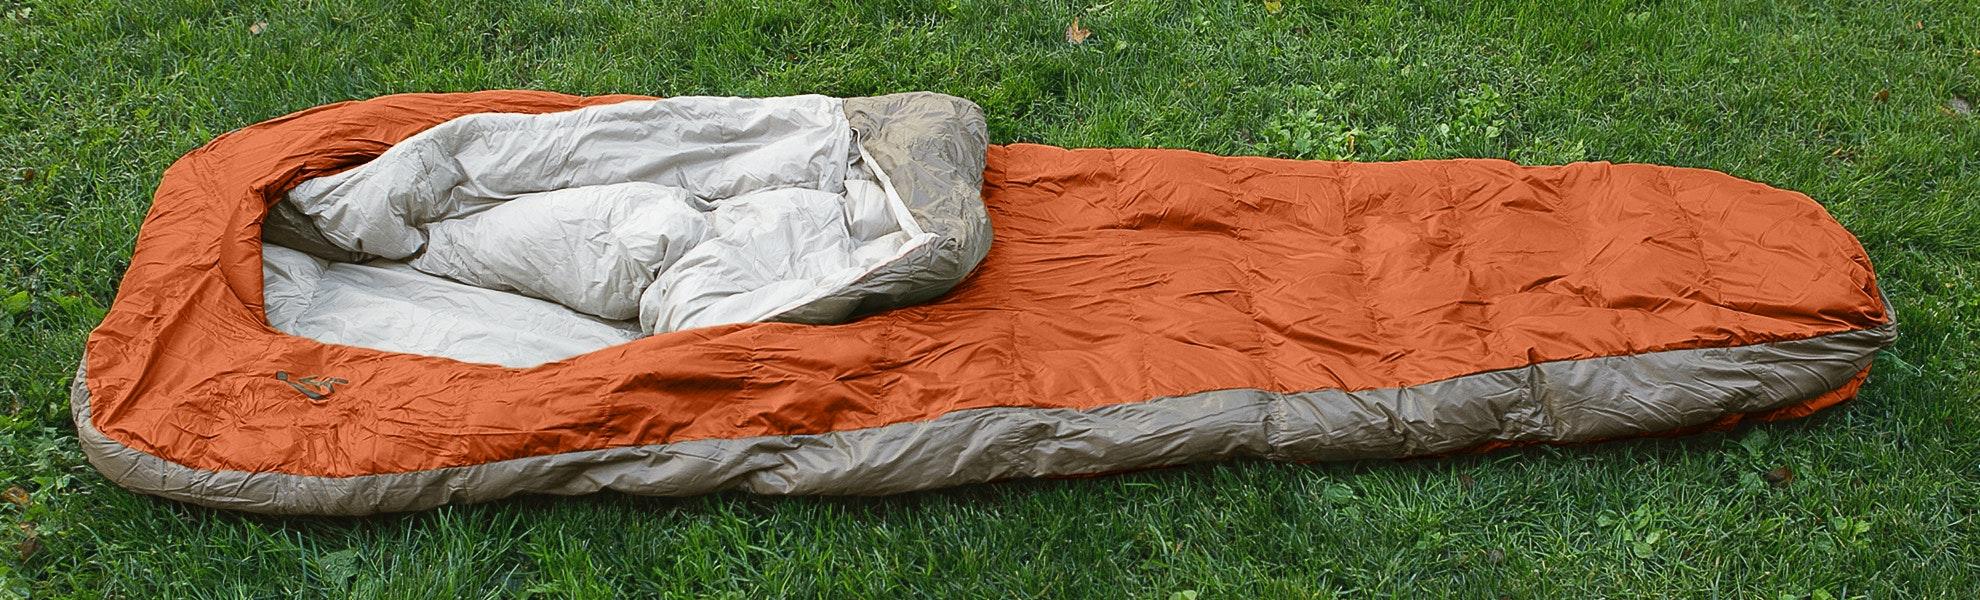 Sierra Designs Backcountry Bed 600 2-Season Long